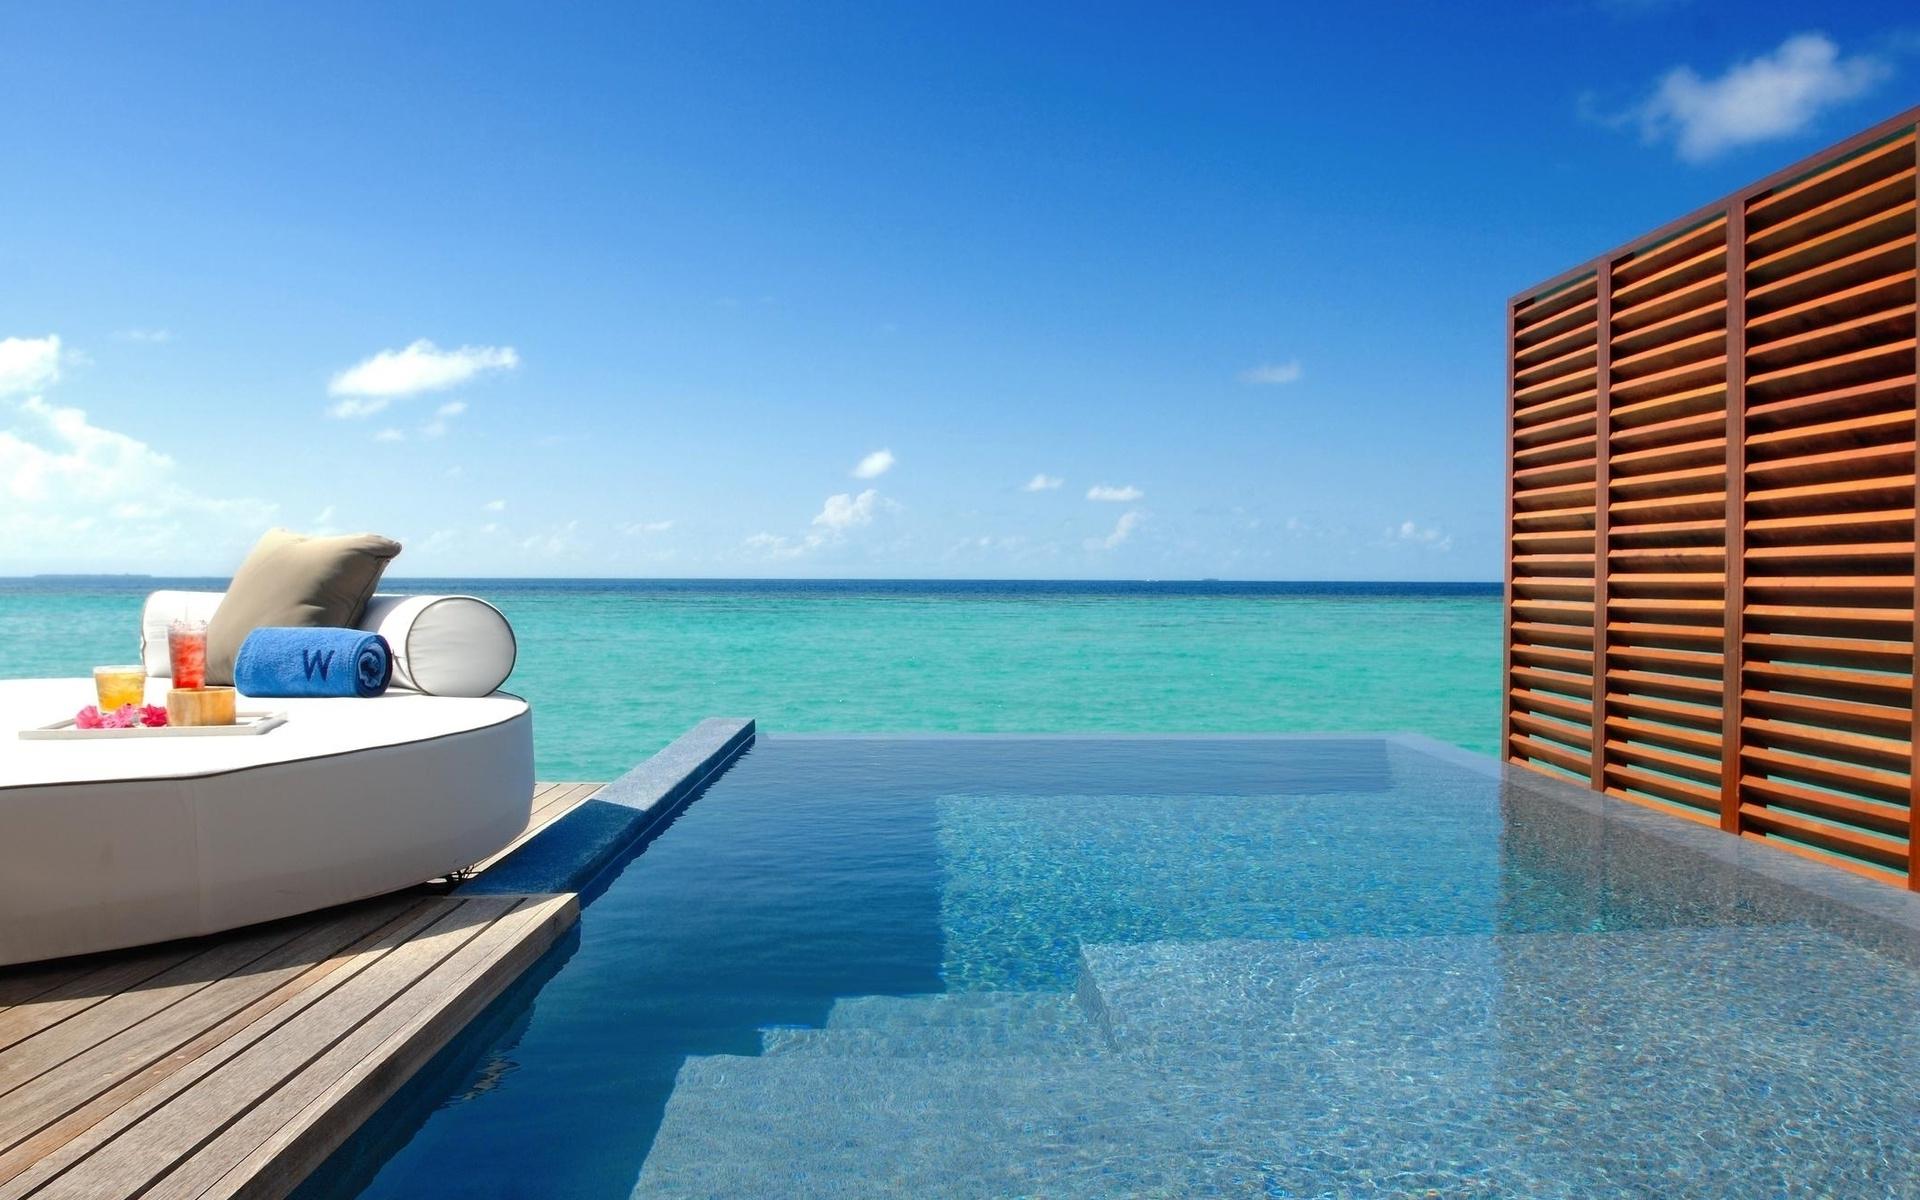 Exotic resort wallpaper 29416 1920x1200